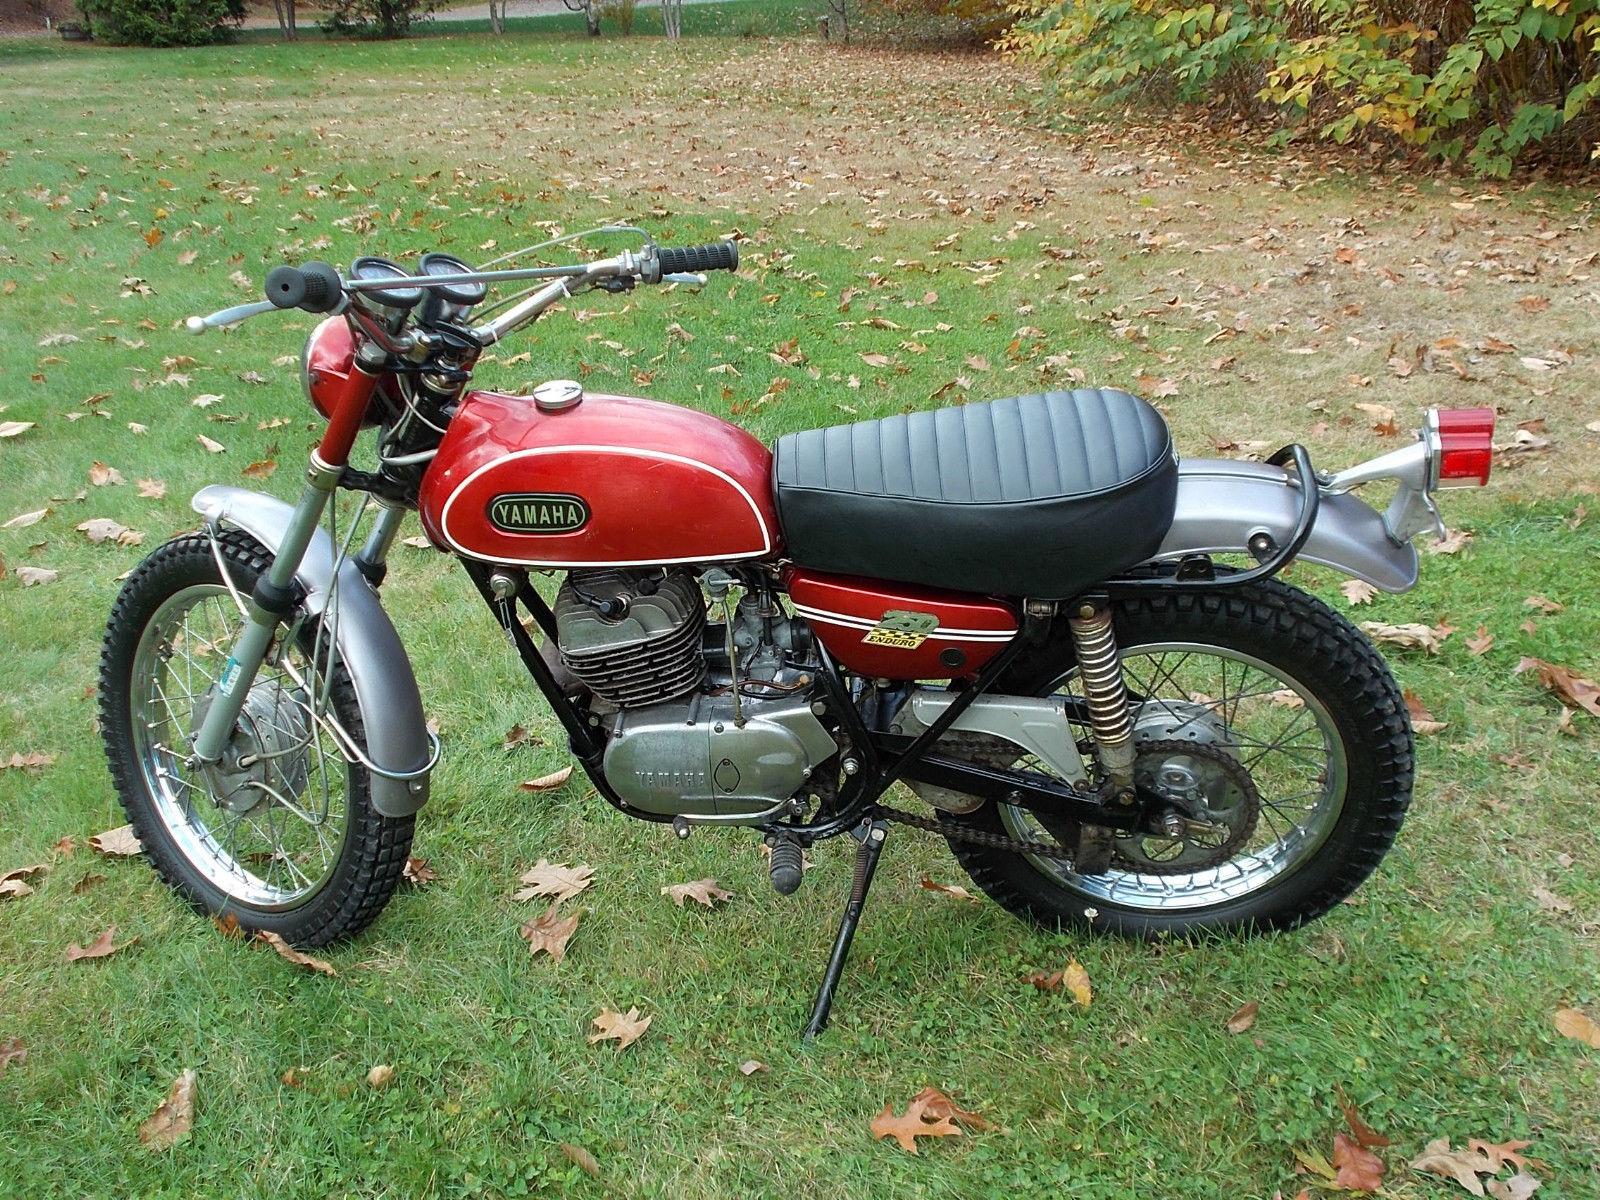 1970 Yamaha DT 1 250 Enduro Clean Vintage Bike Survivor